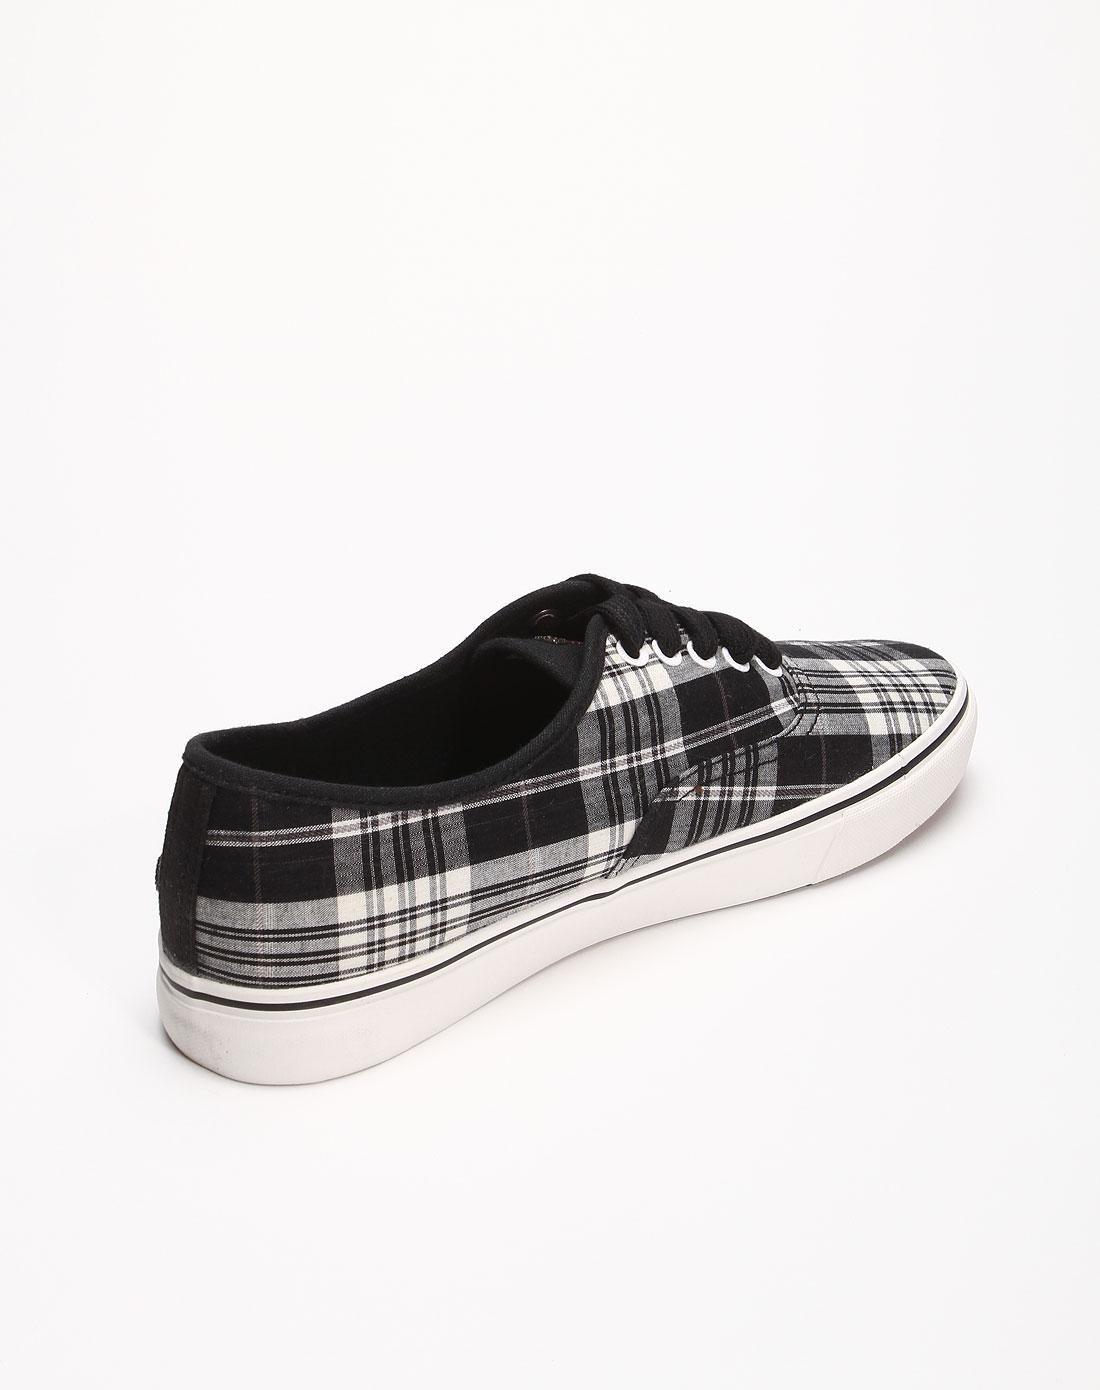 cooper男女装男款黑/白色格纹休闲时尚布鞋j